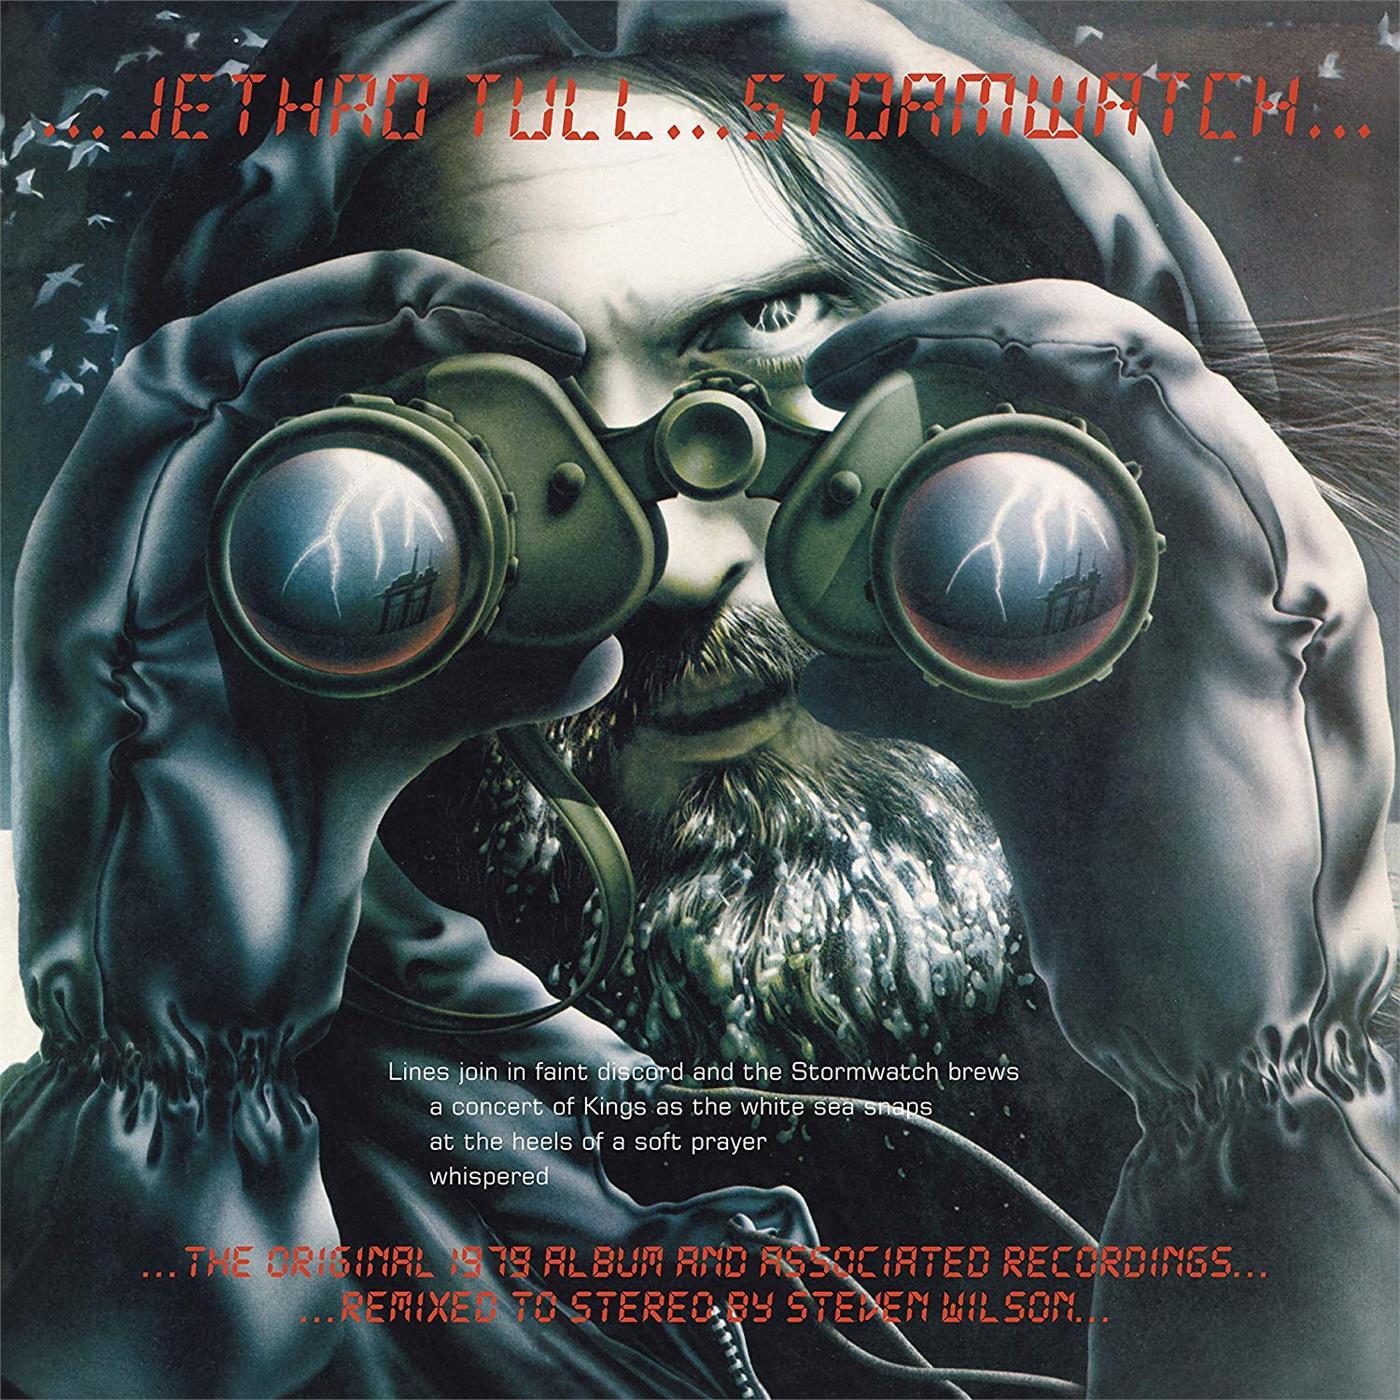 Jethro Tull - Stormwatch [LP] (Steven Wilson stereo remix)